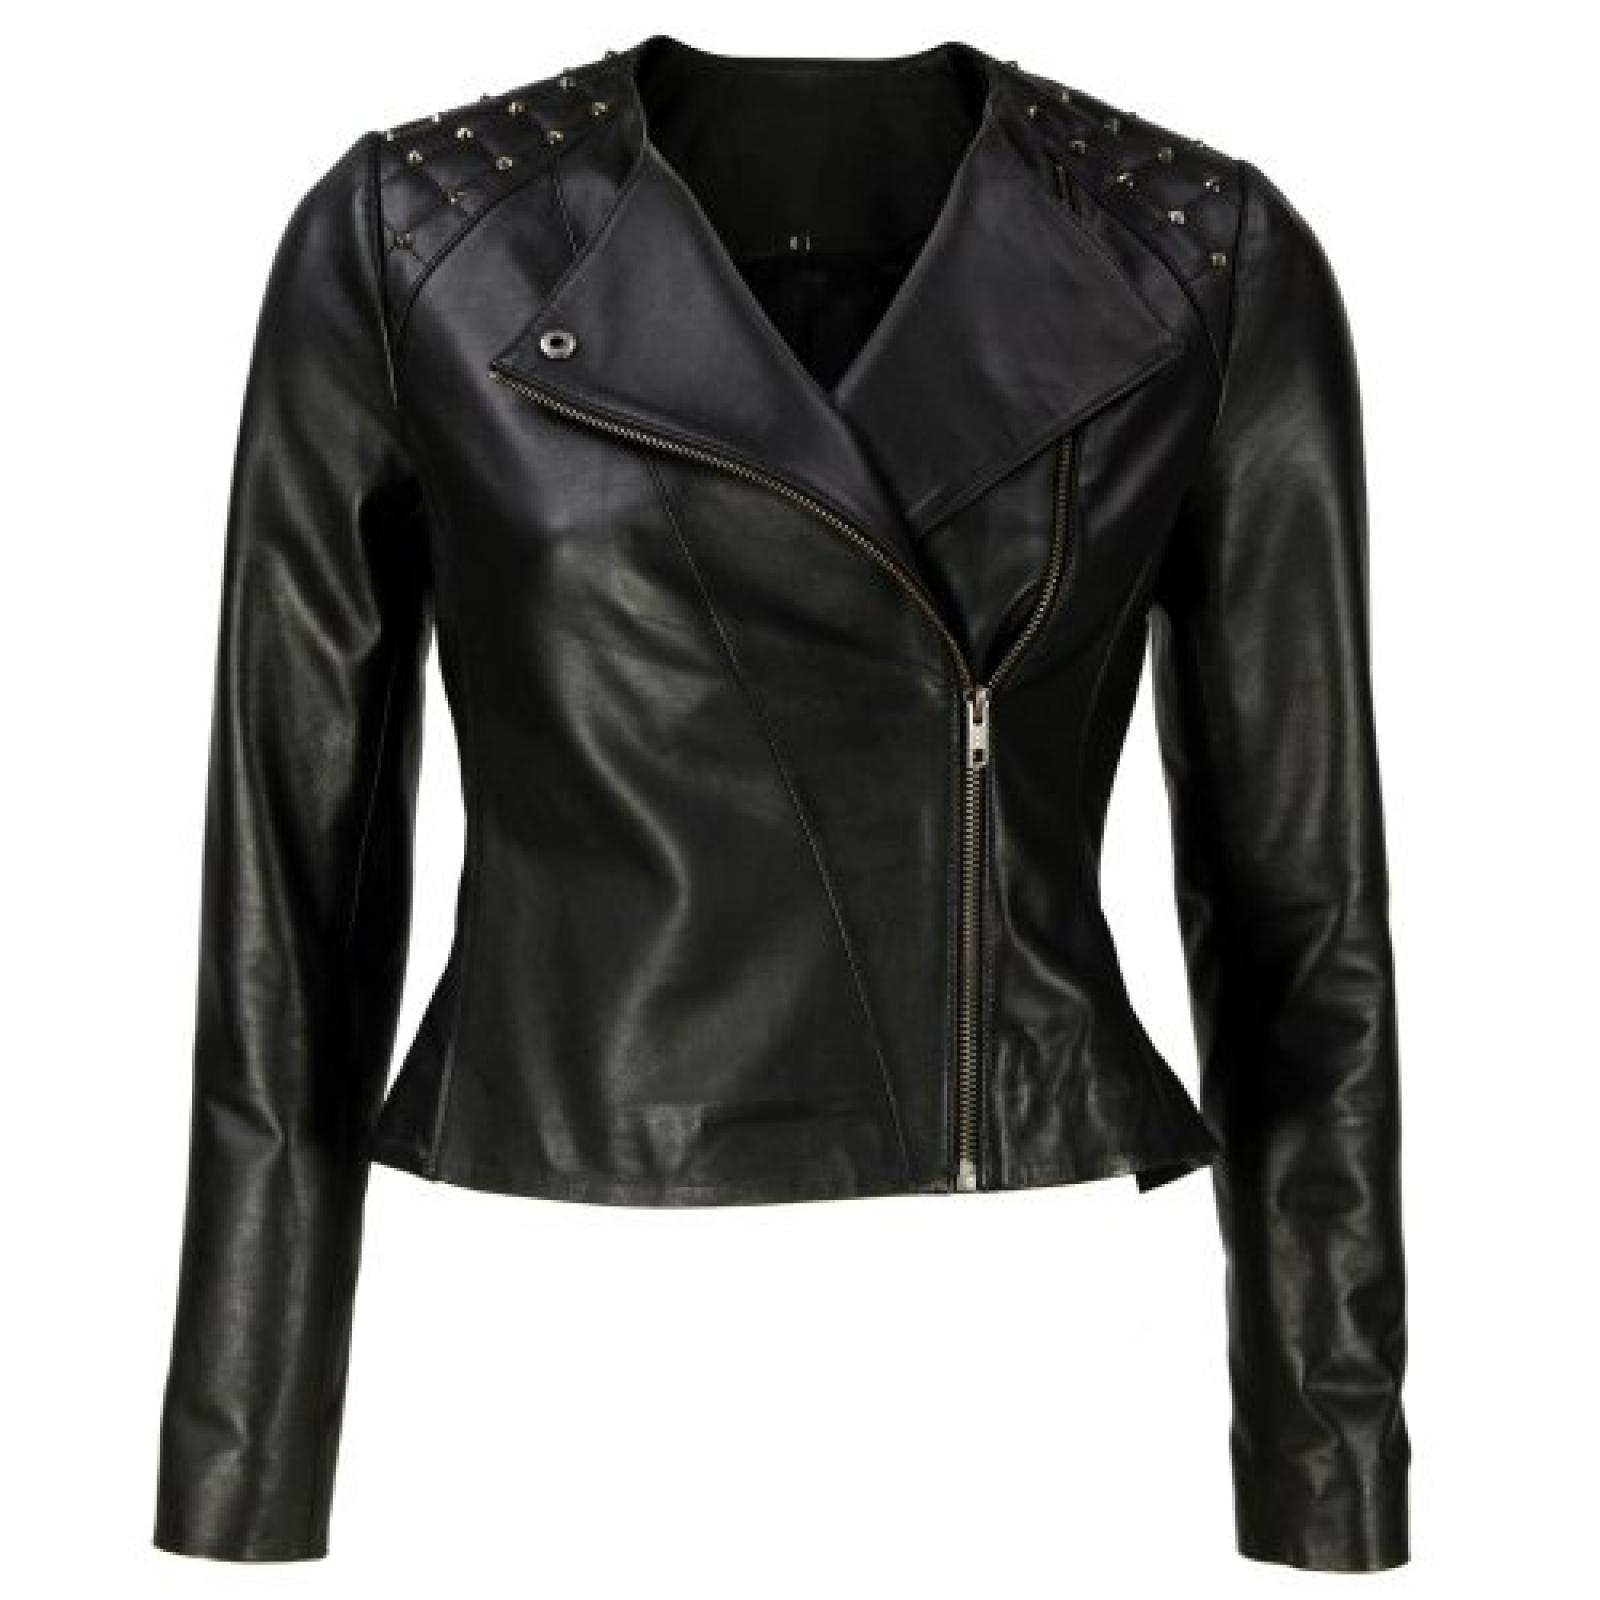 VIPARO Black Silver Studded Asymmetrical Biker Lambskin Leather Jacket - Jenna